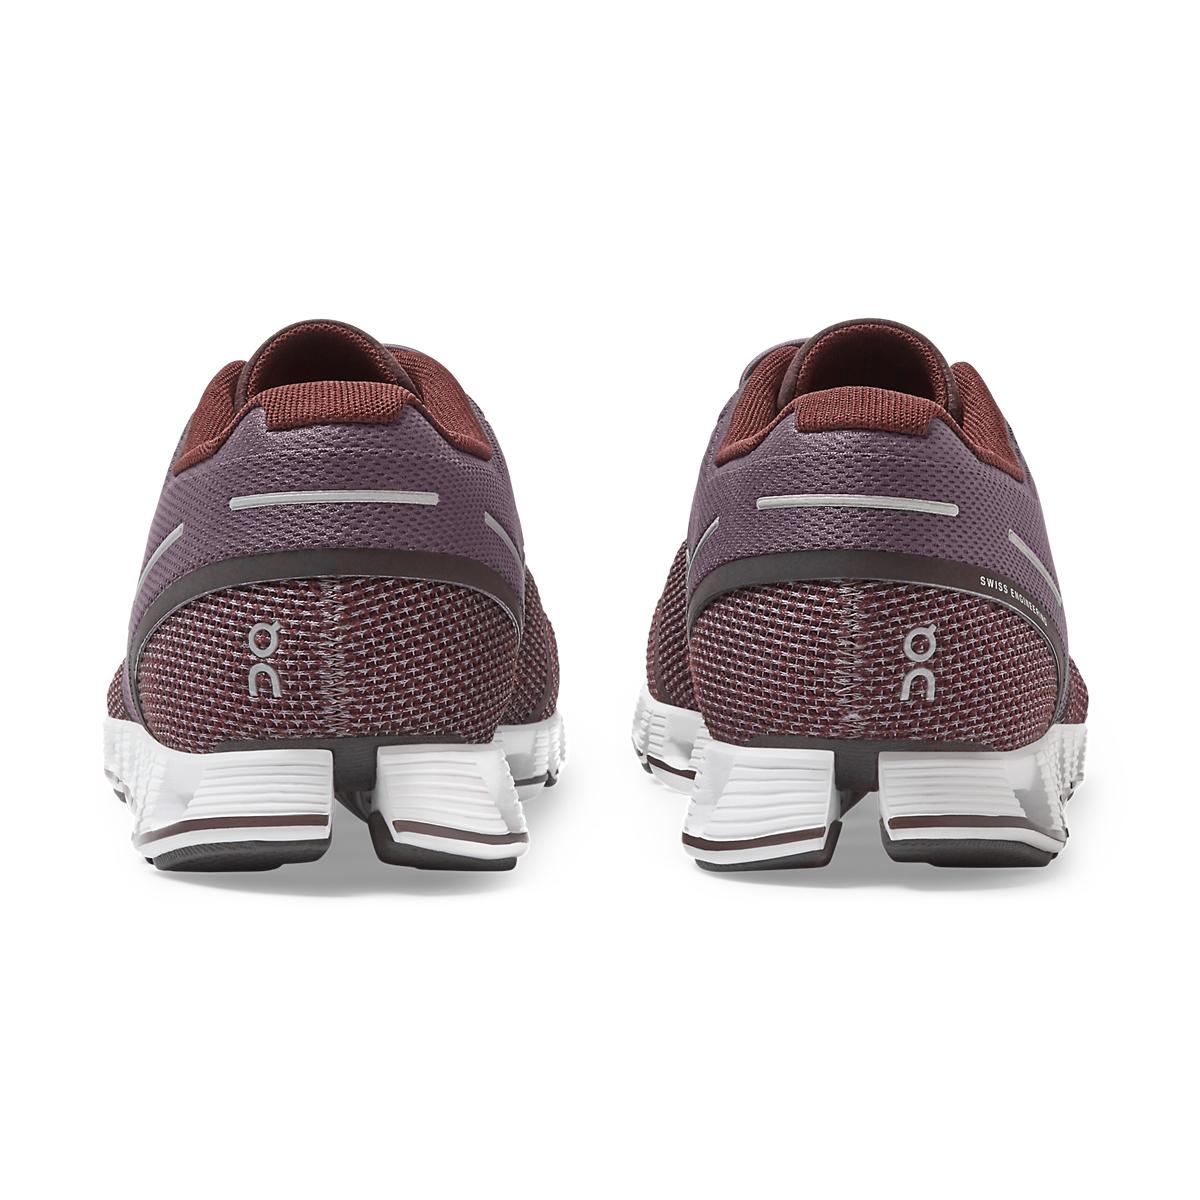 Men's On Cloud Running Shoe - Color: Pebble/Raisin - Size: 7.5 - Width: Regular, Pebble/Raisin, large, image 3